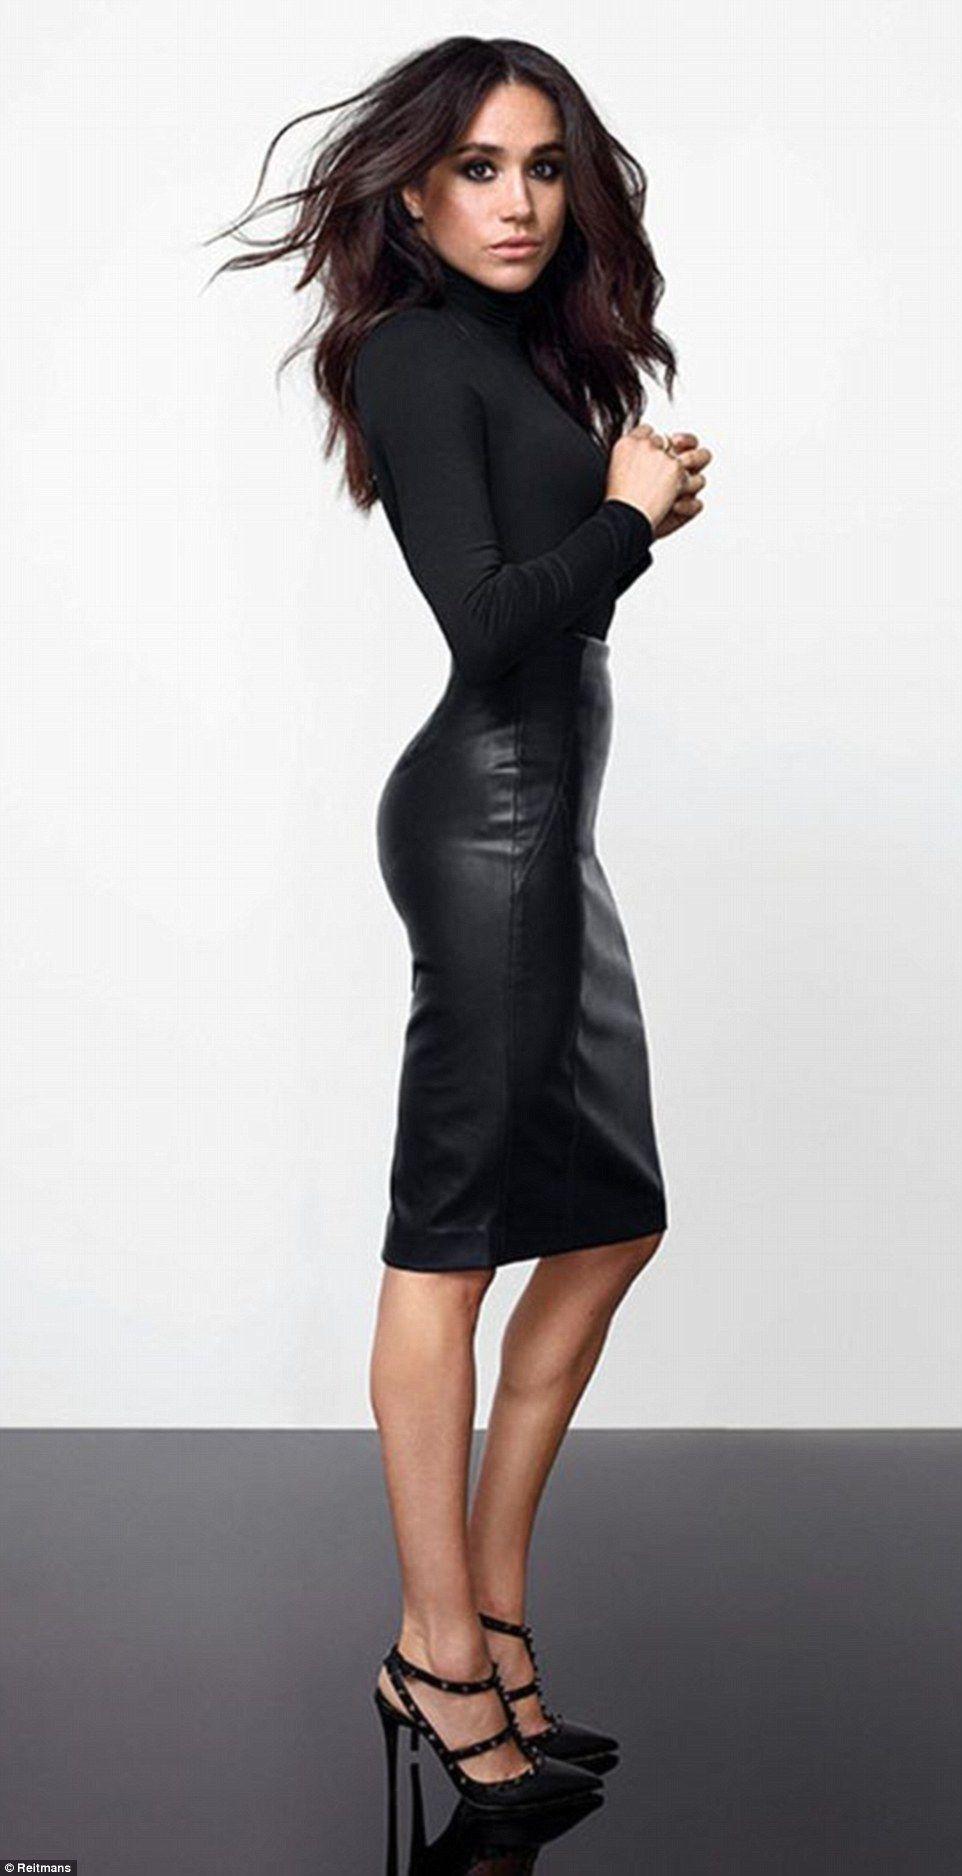 Meghan Markle showcases her INCREDIBLE figure